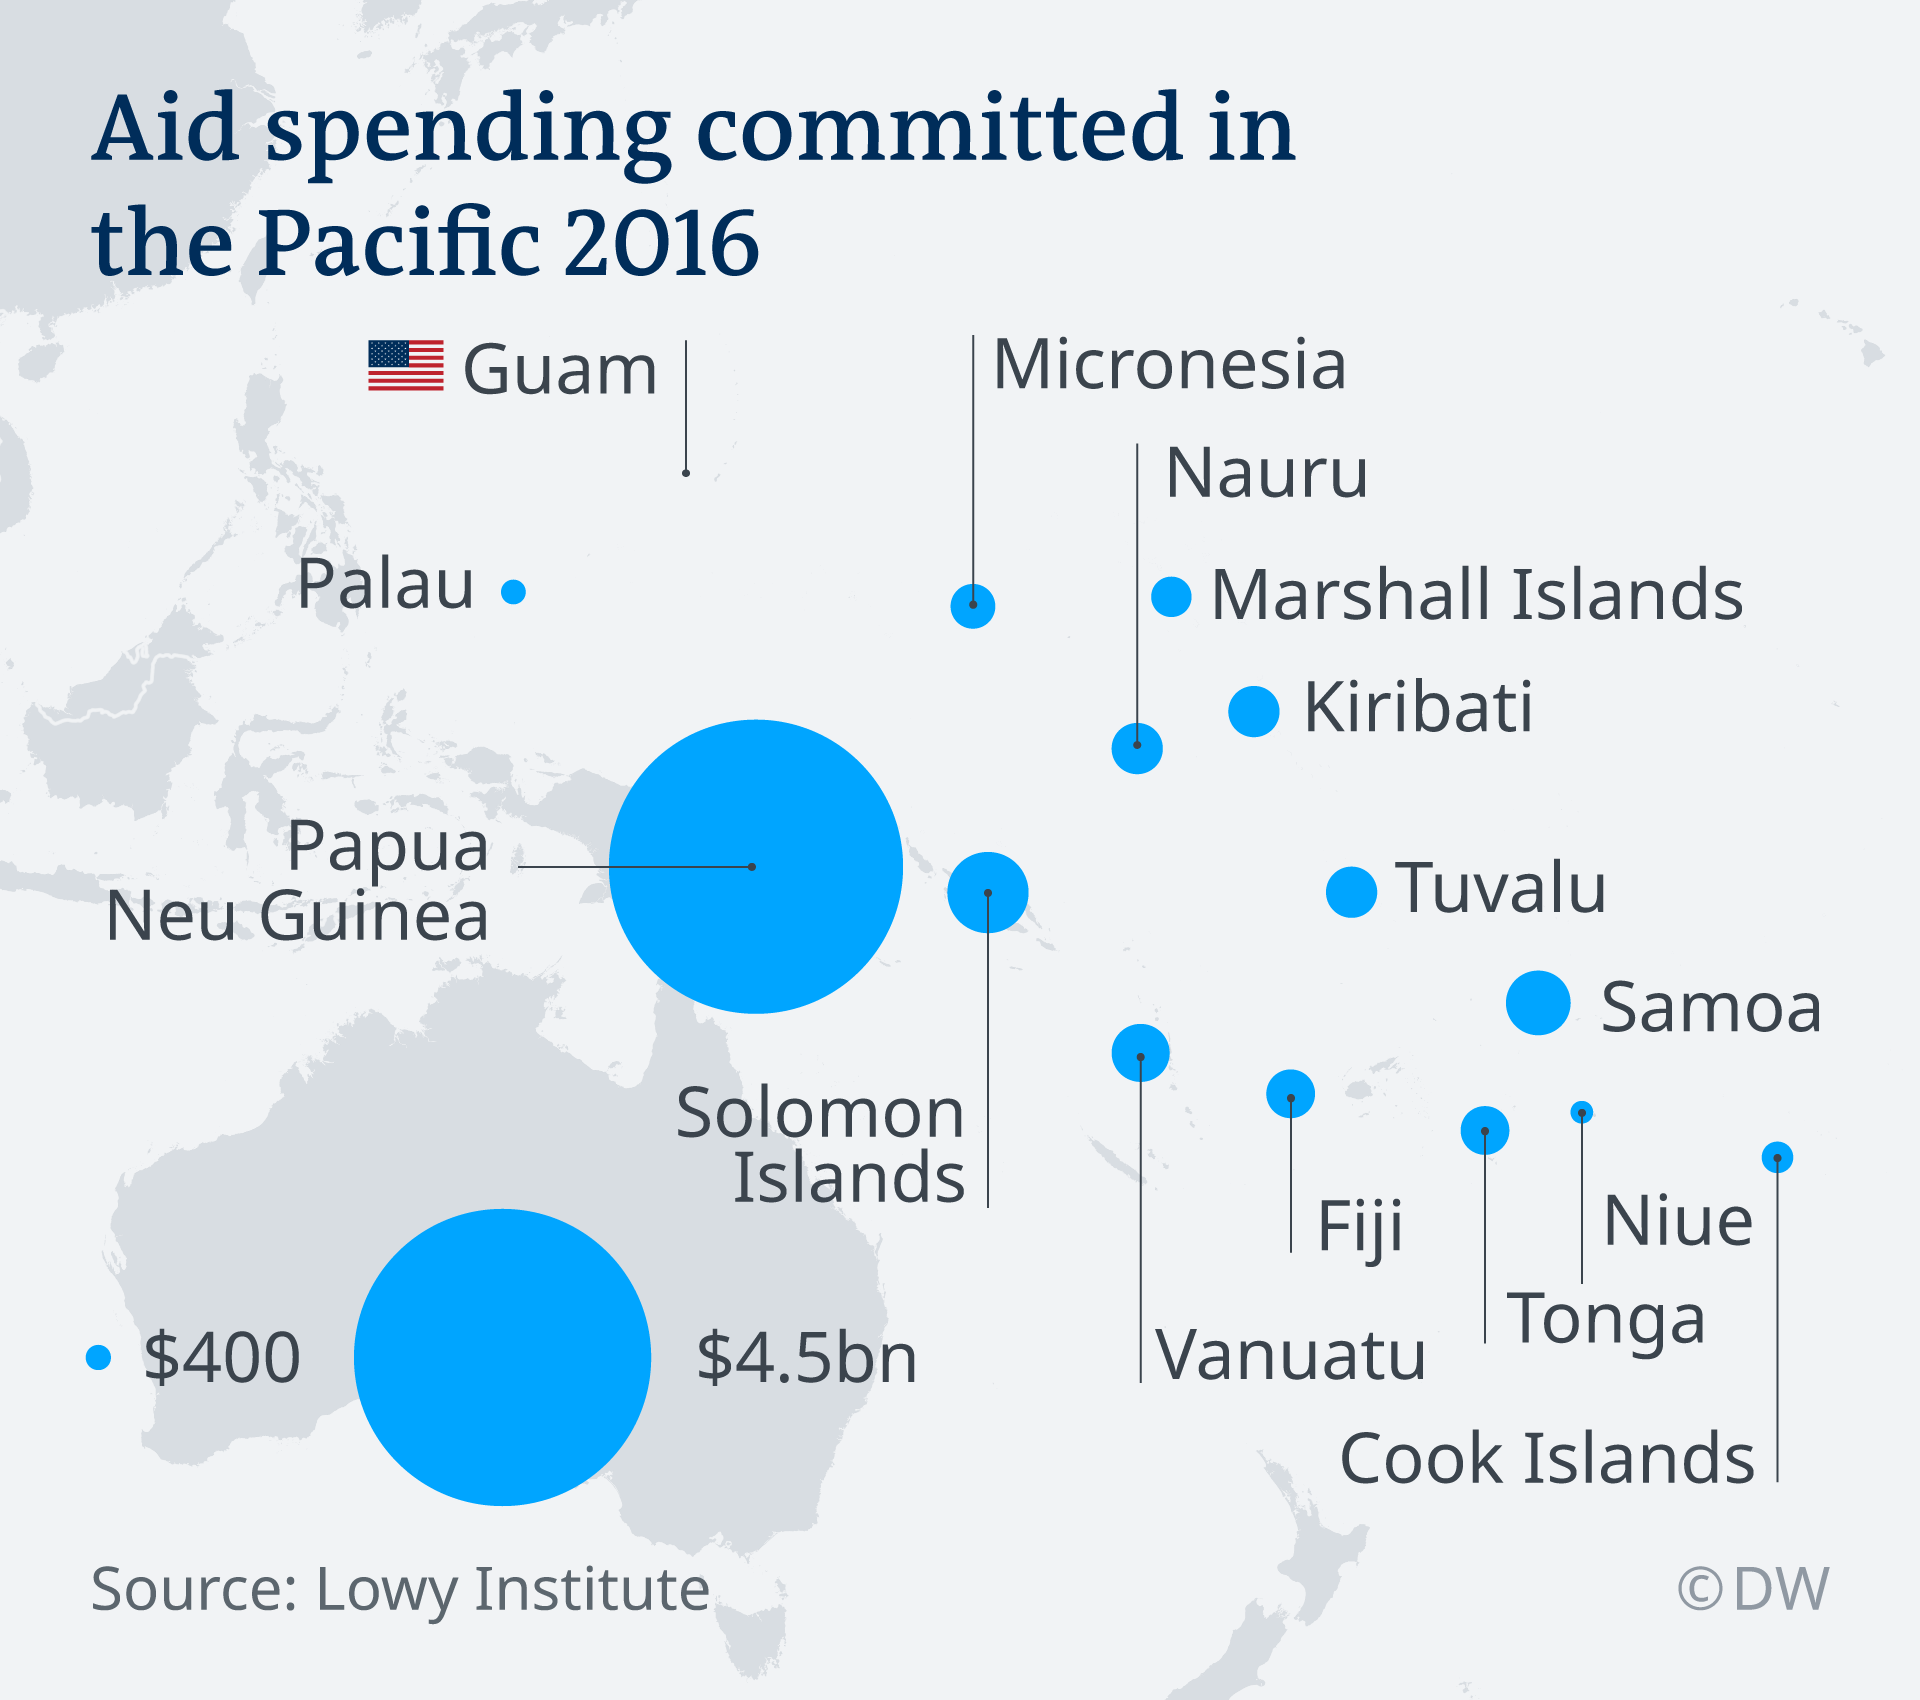 Total bantuan dana dari Amerika Serikat untuk negara kawasan di Asia Pasifik hingga 2016.